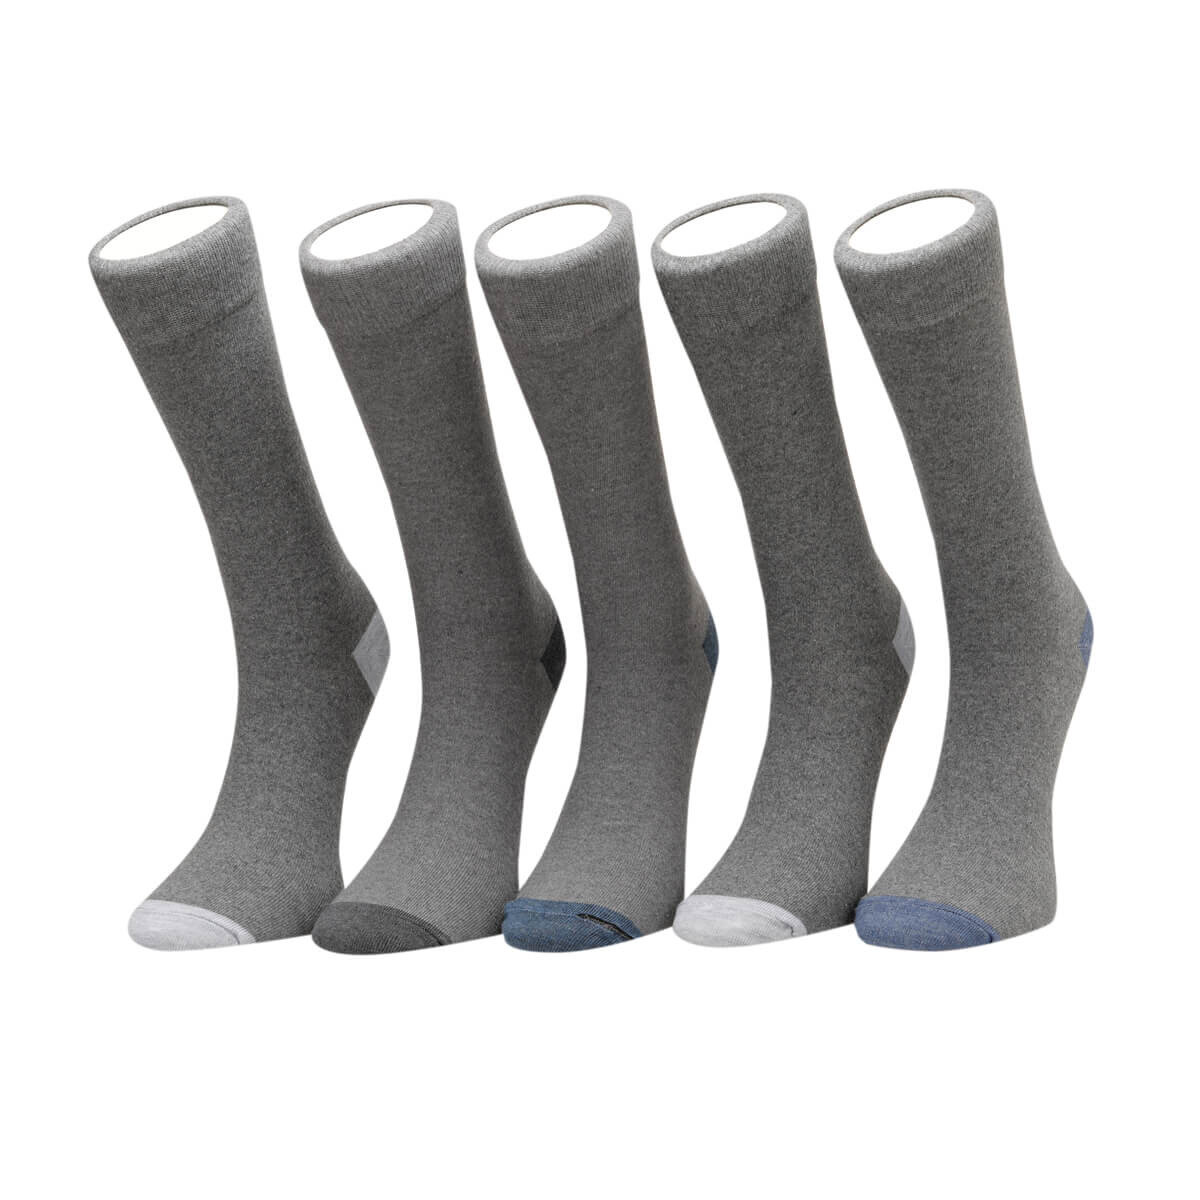 FLO RENK8 5 LI SKT-M GRAY MULTI Male Socket Socks Garamond